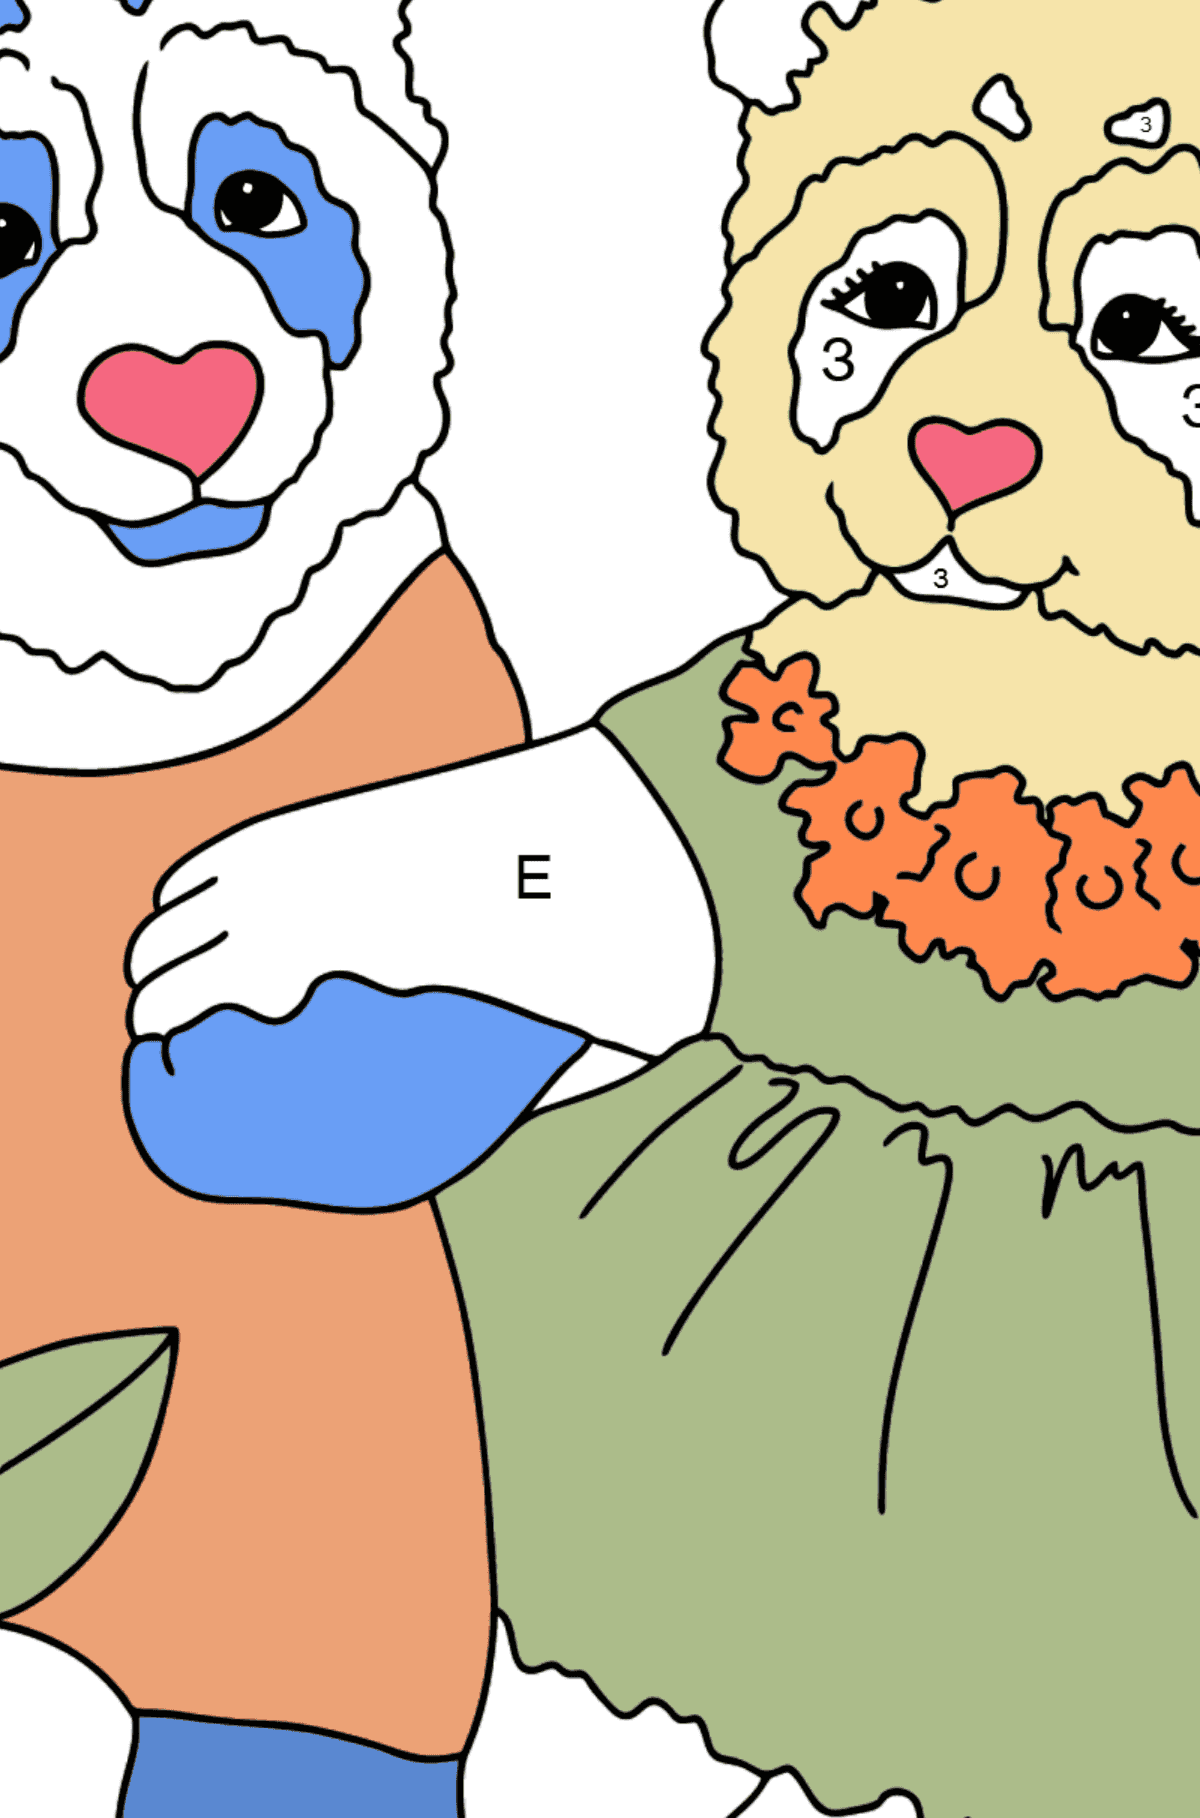 Раскраска Панды гуляют - Раскраска по Буквам для Детей